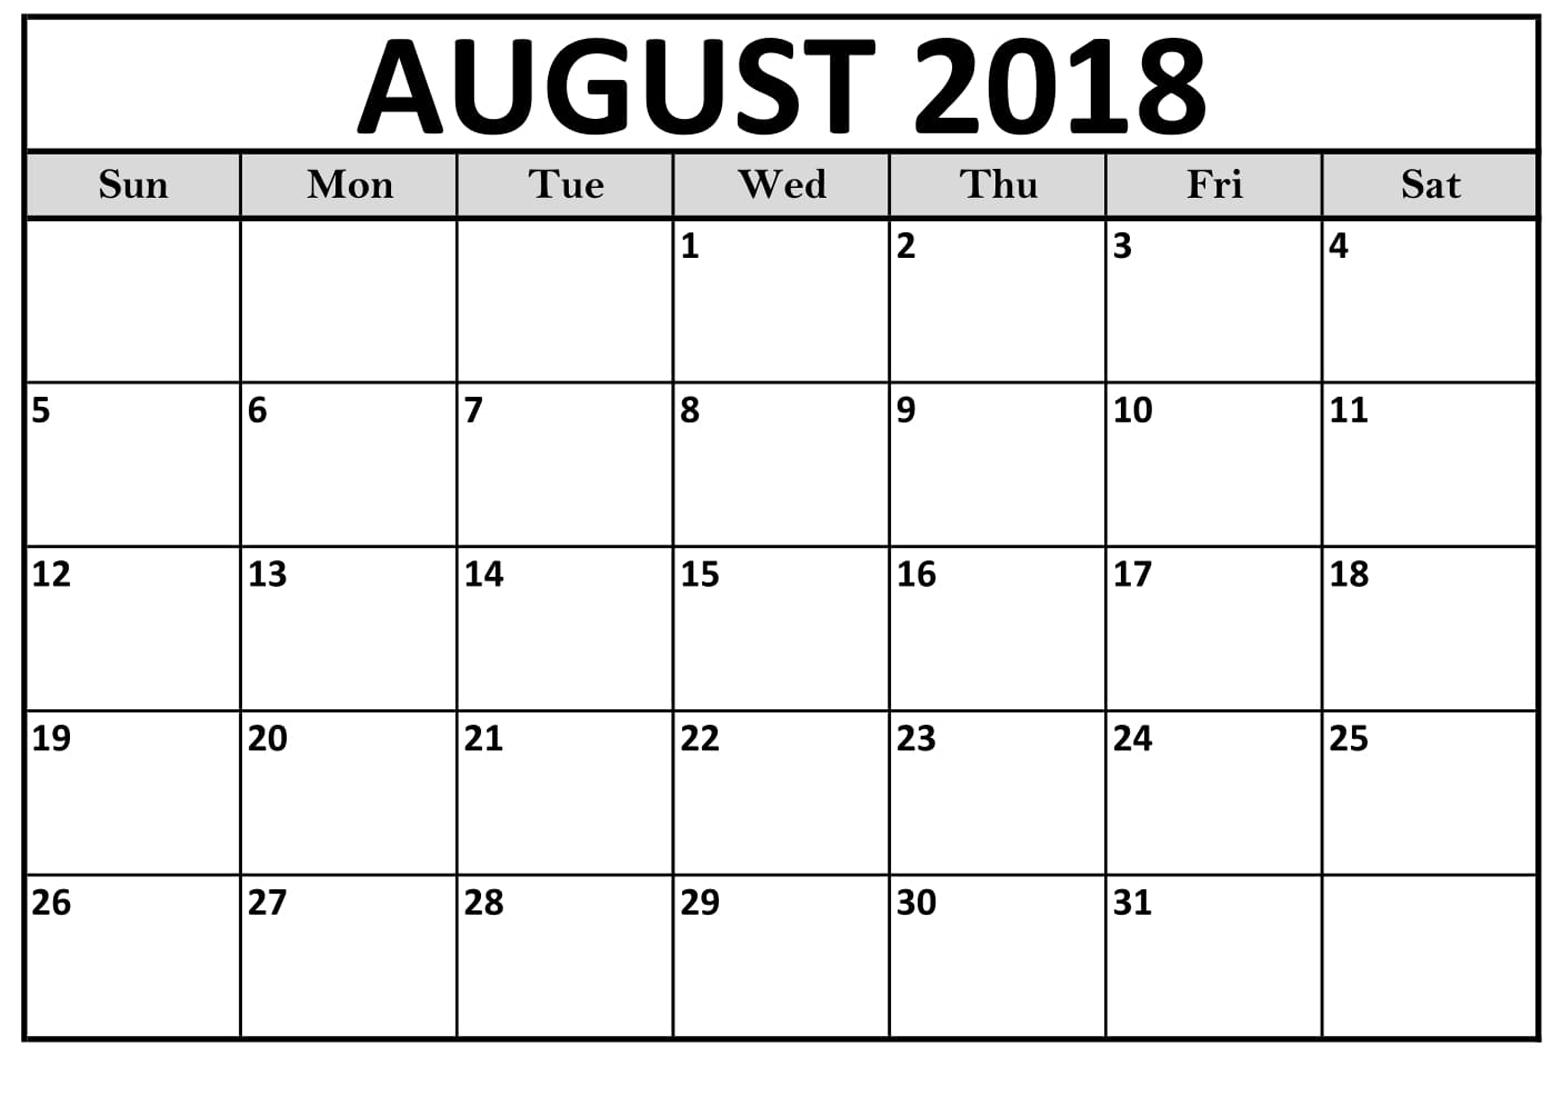 printable calendar august 2018 uk printable calendar templates Calendar August 2018 Printable Uk erdferdf